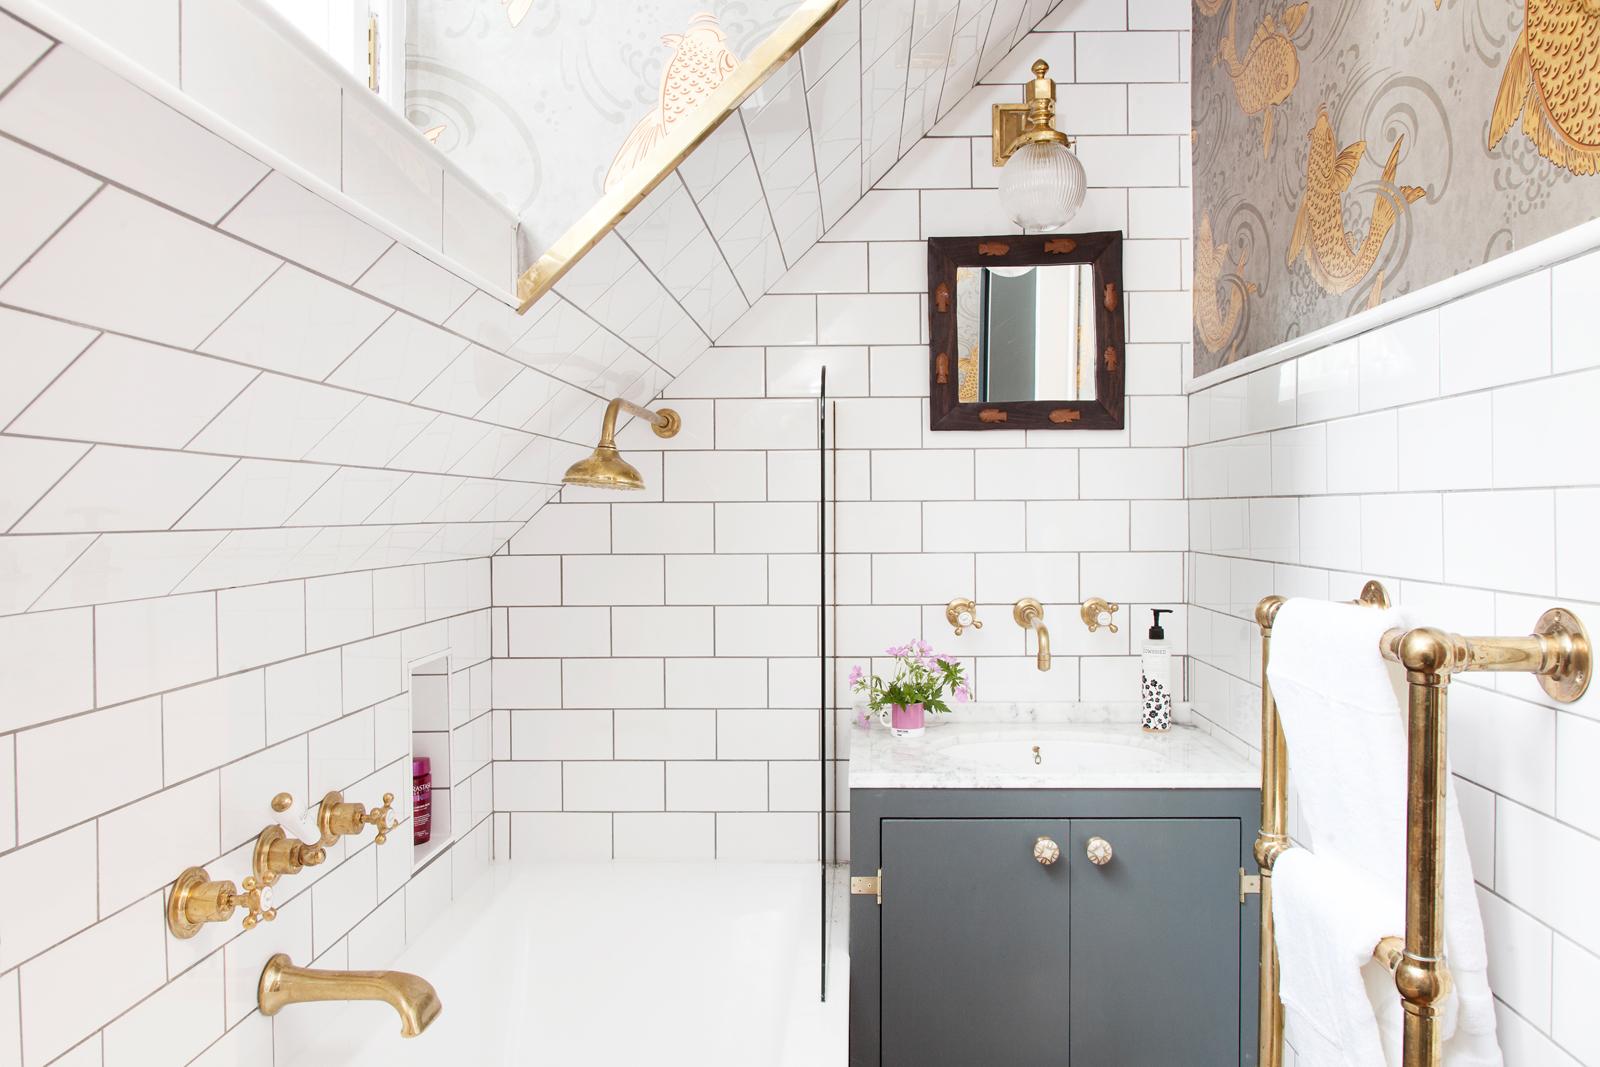 Bathroom Tile Designs Small Bathroom Tile Ideas JVQLTNP